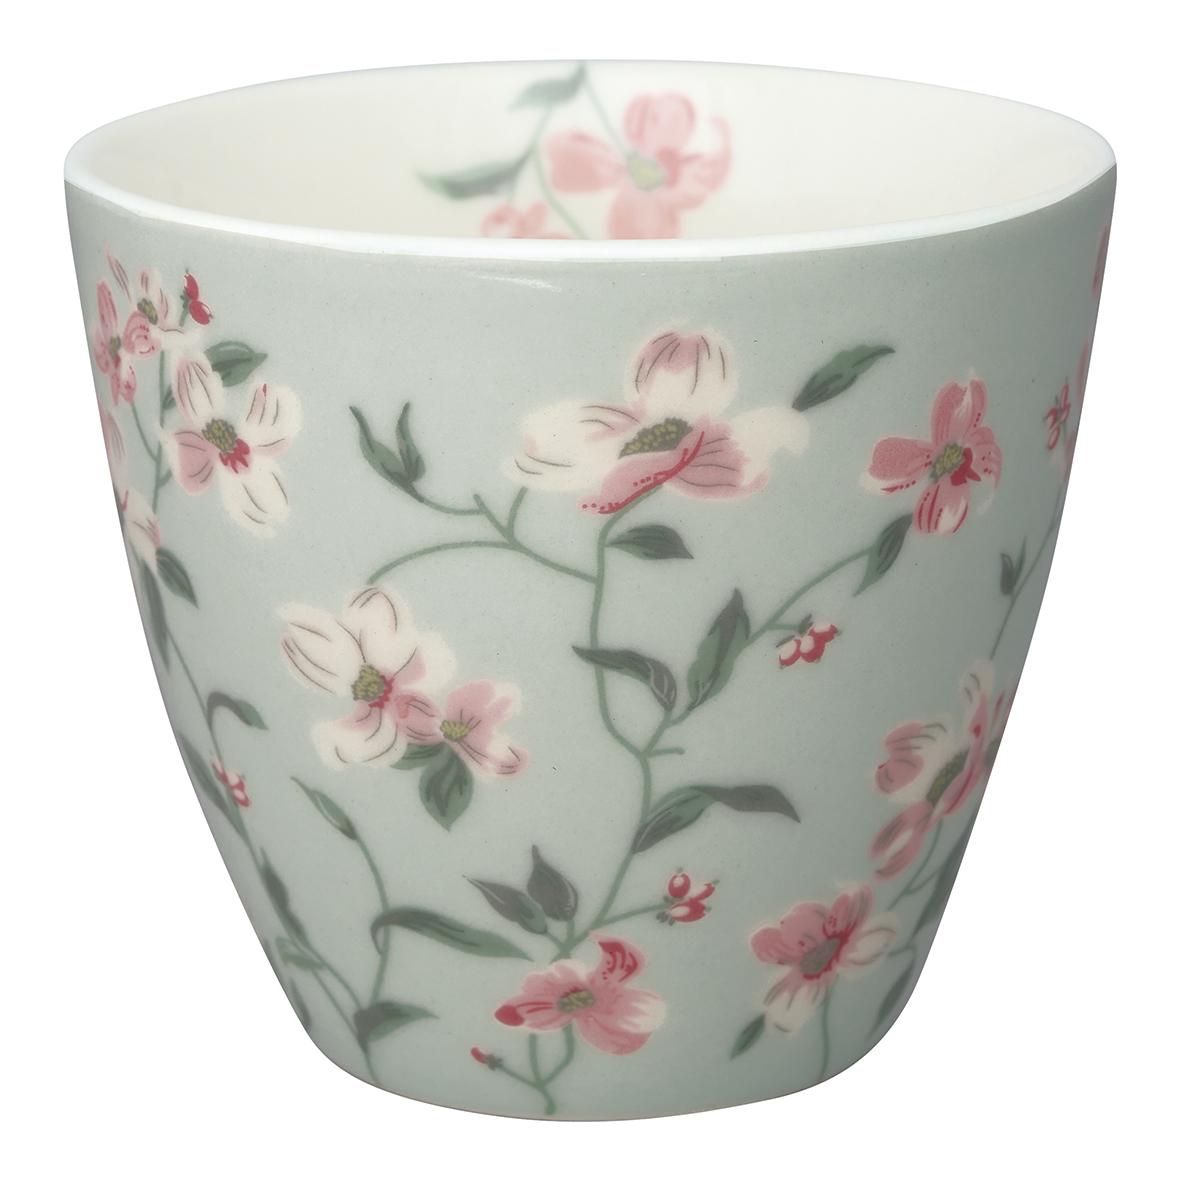 GreenGate Becher Latte Cup Jolie Pale Mint